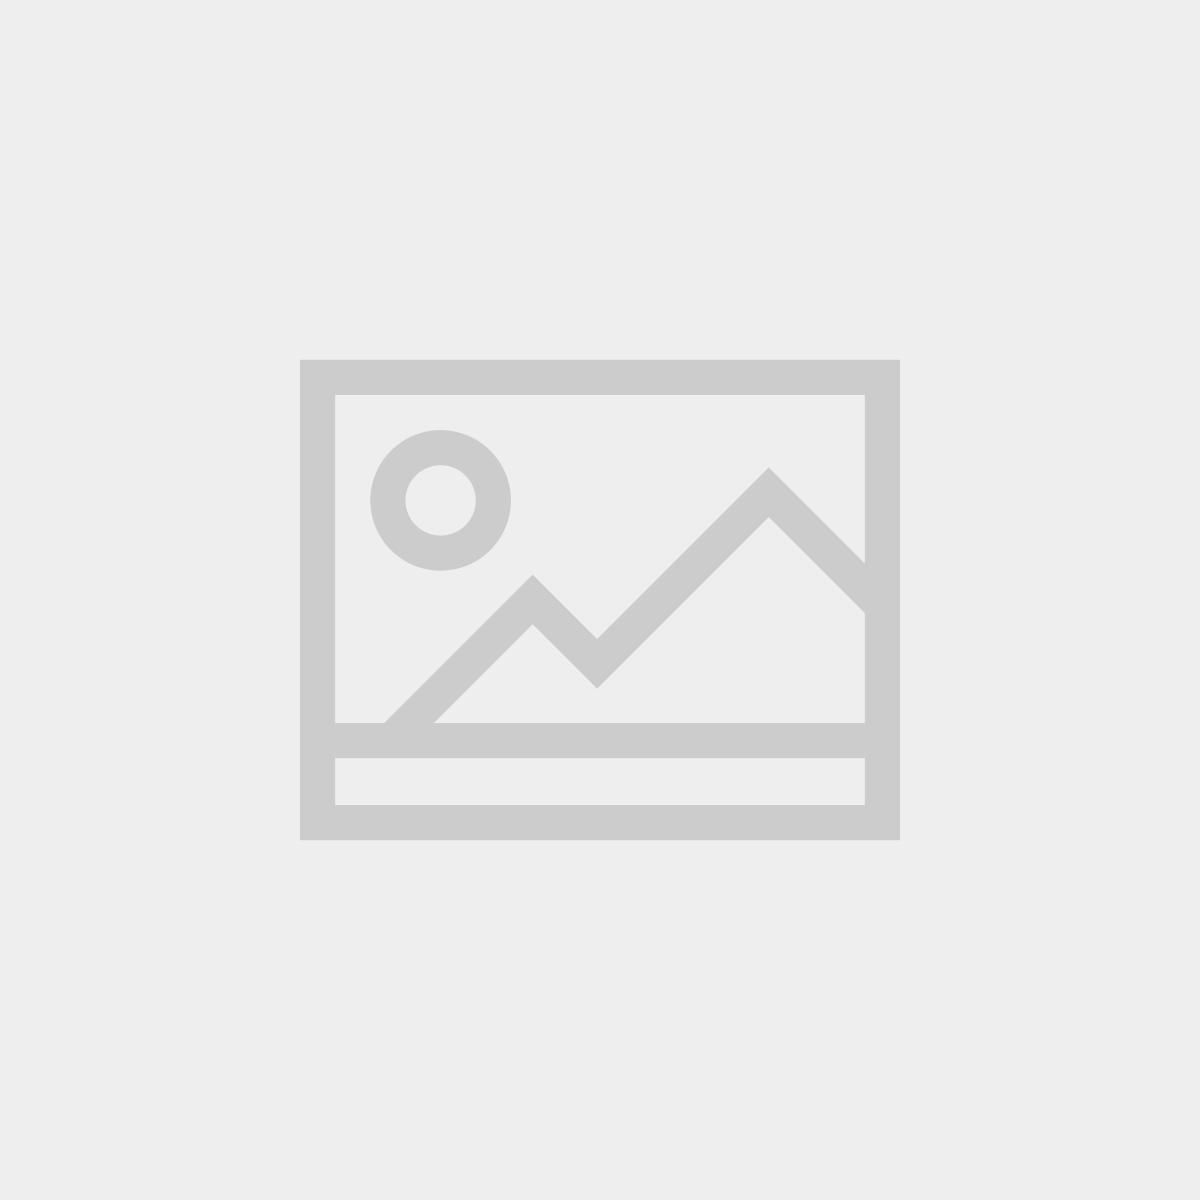 """ДЕВОЧКИ В НАУКЕ"": ОТКРЫЛАСЬ ЗИМНЯЯ ШКОЛА STEM-КГТИ"